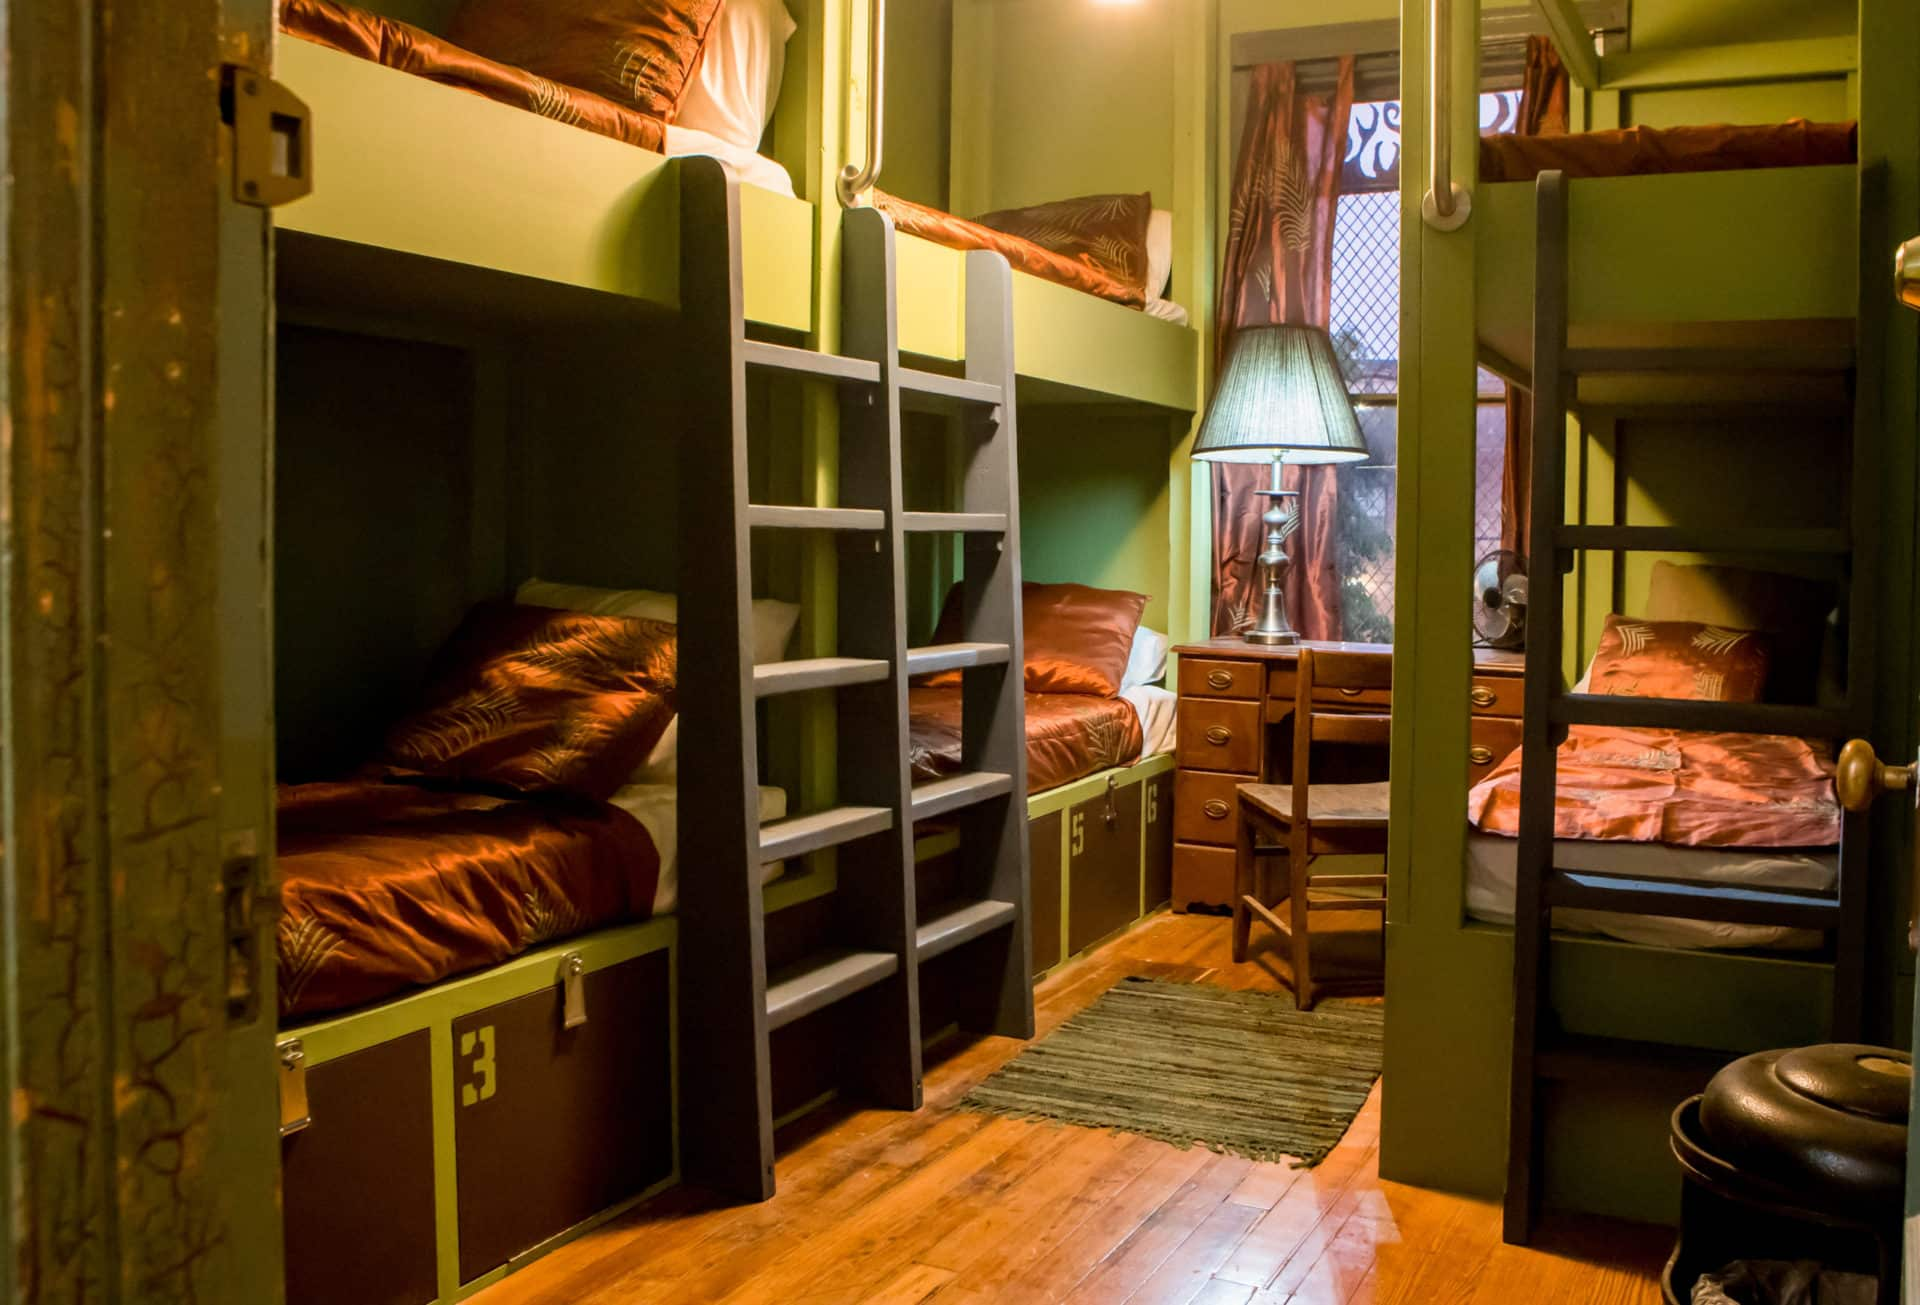 Hostel Dorm Room in Providence, RI